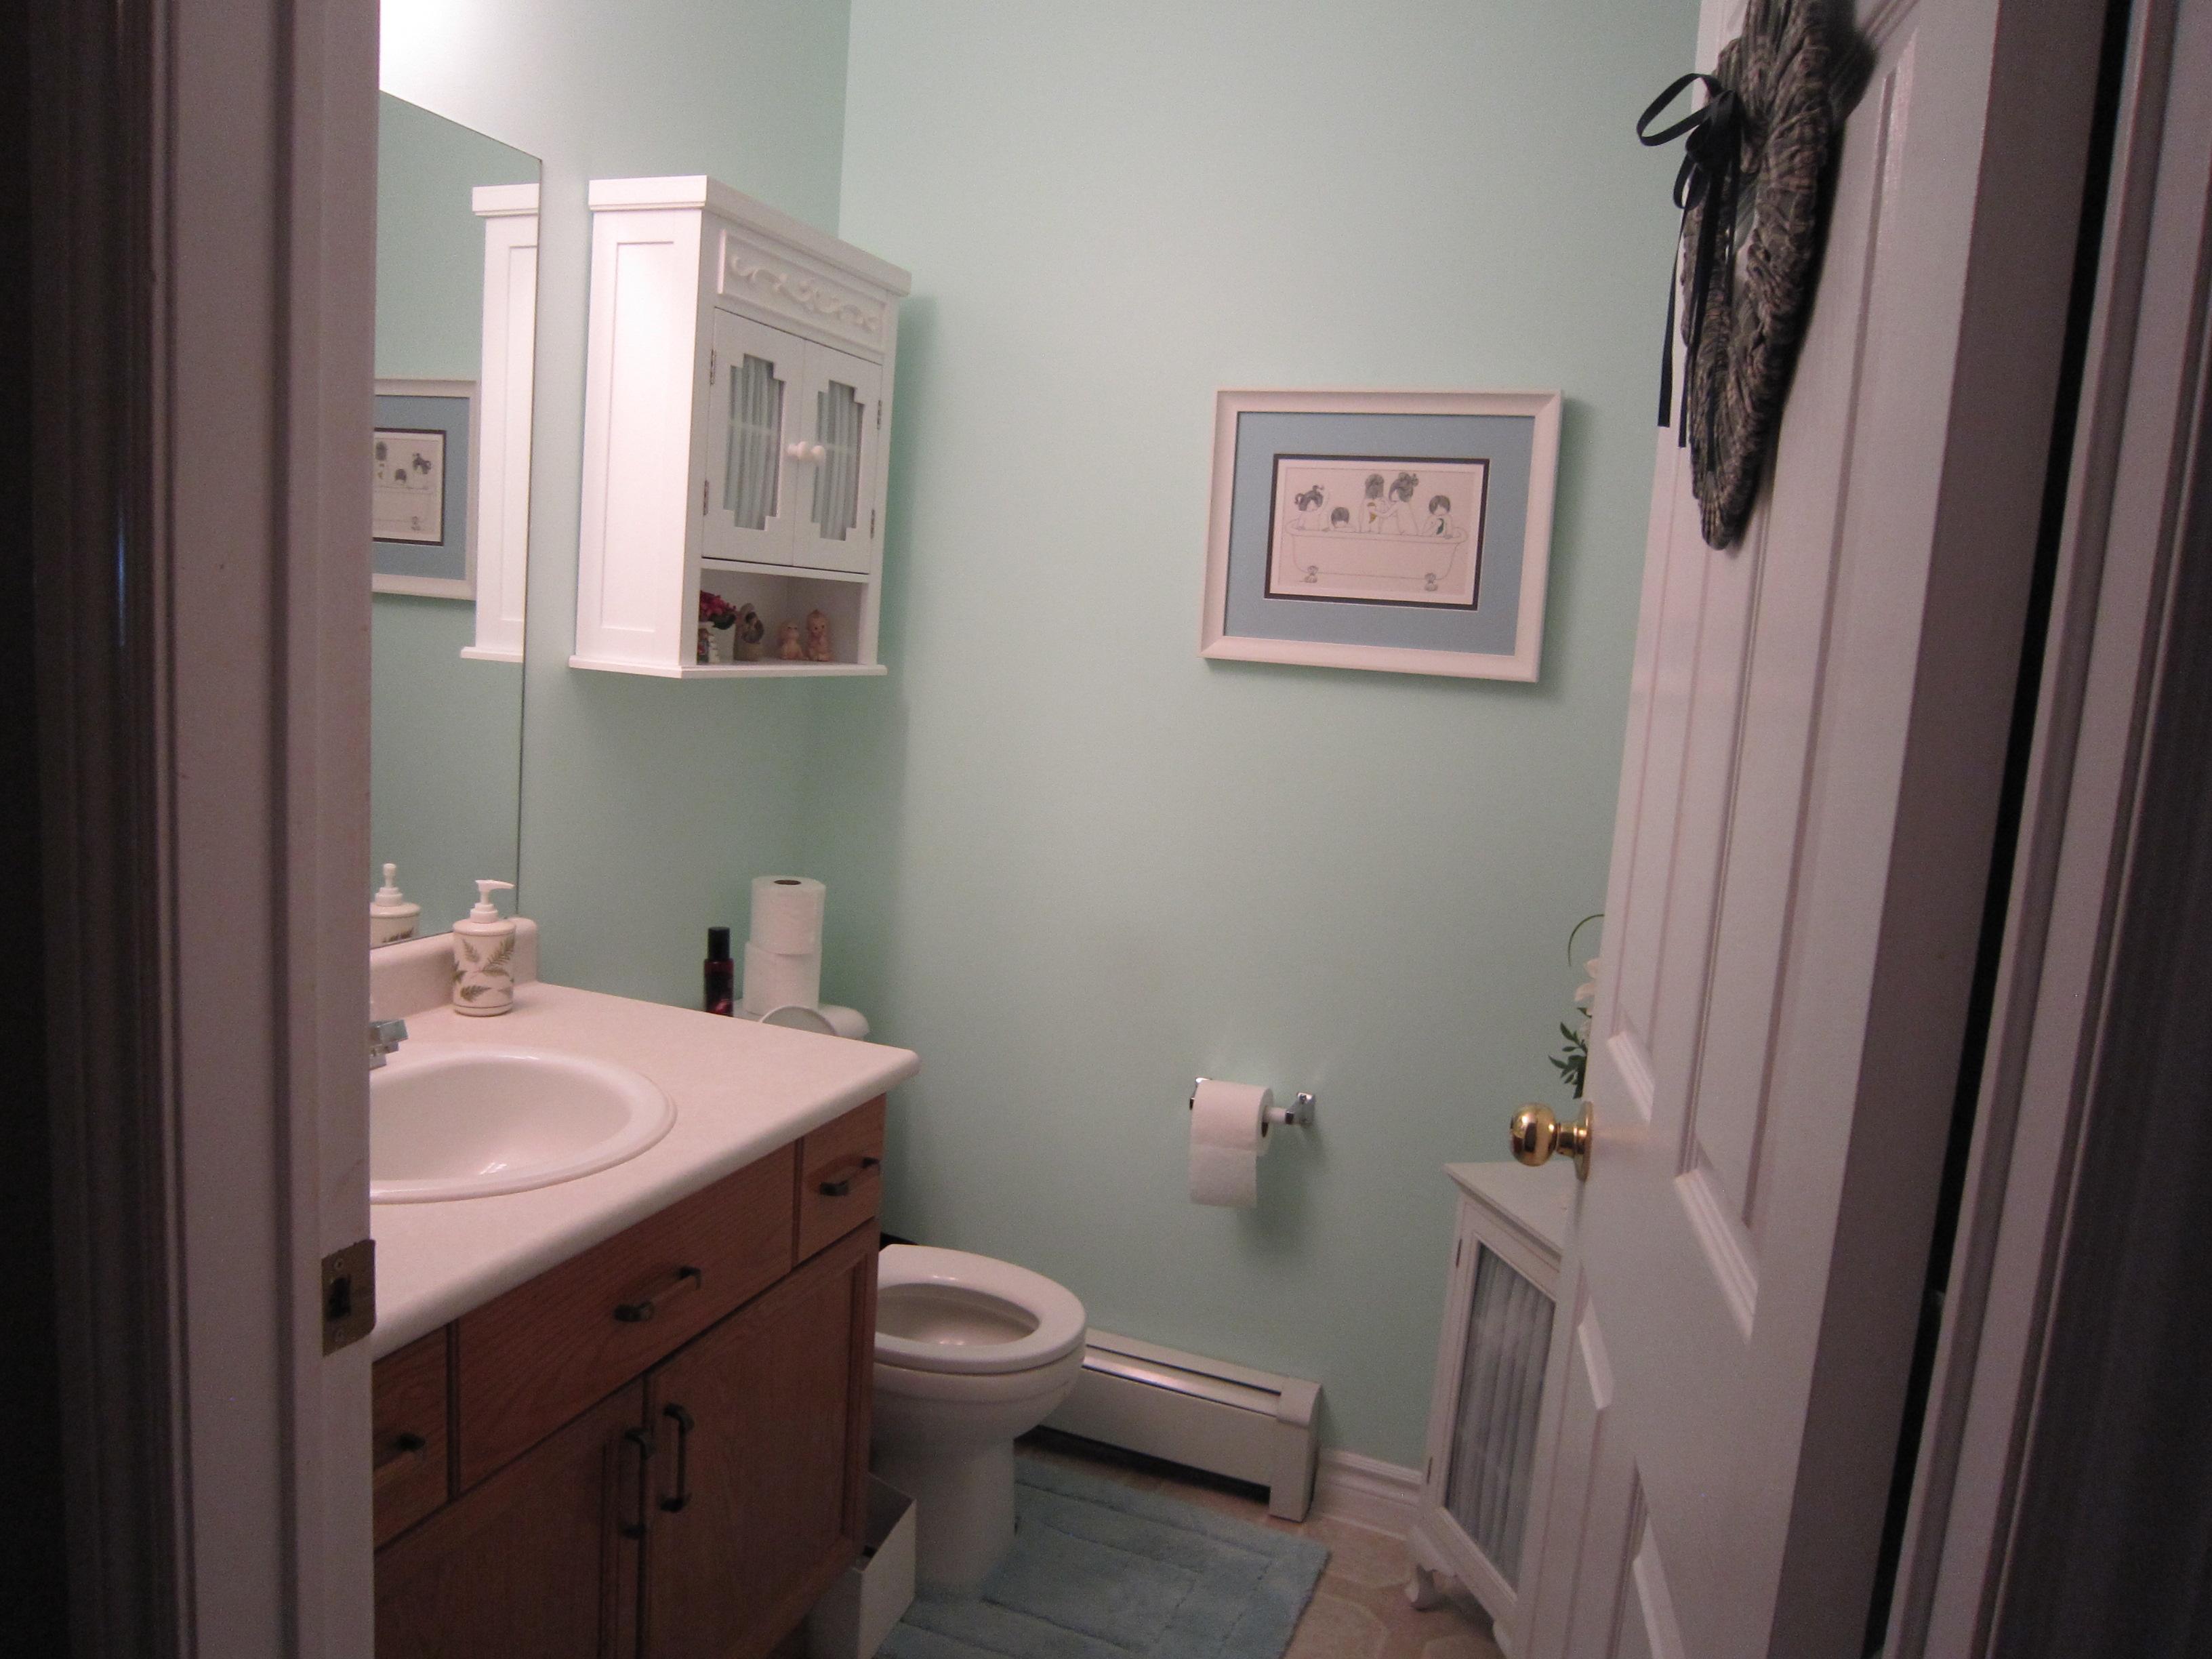 Hare Bathroom